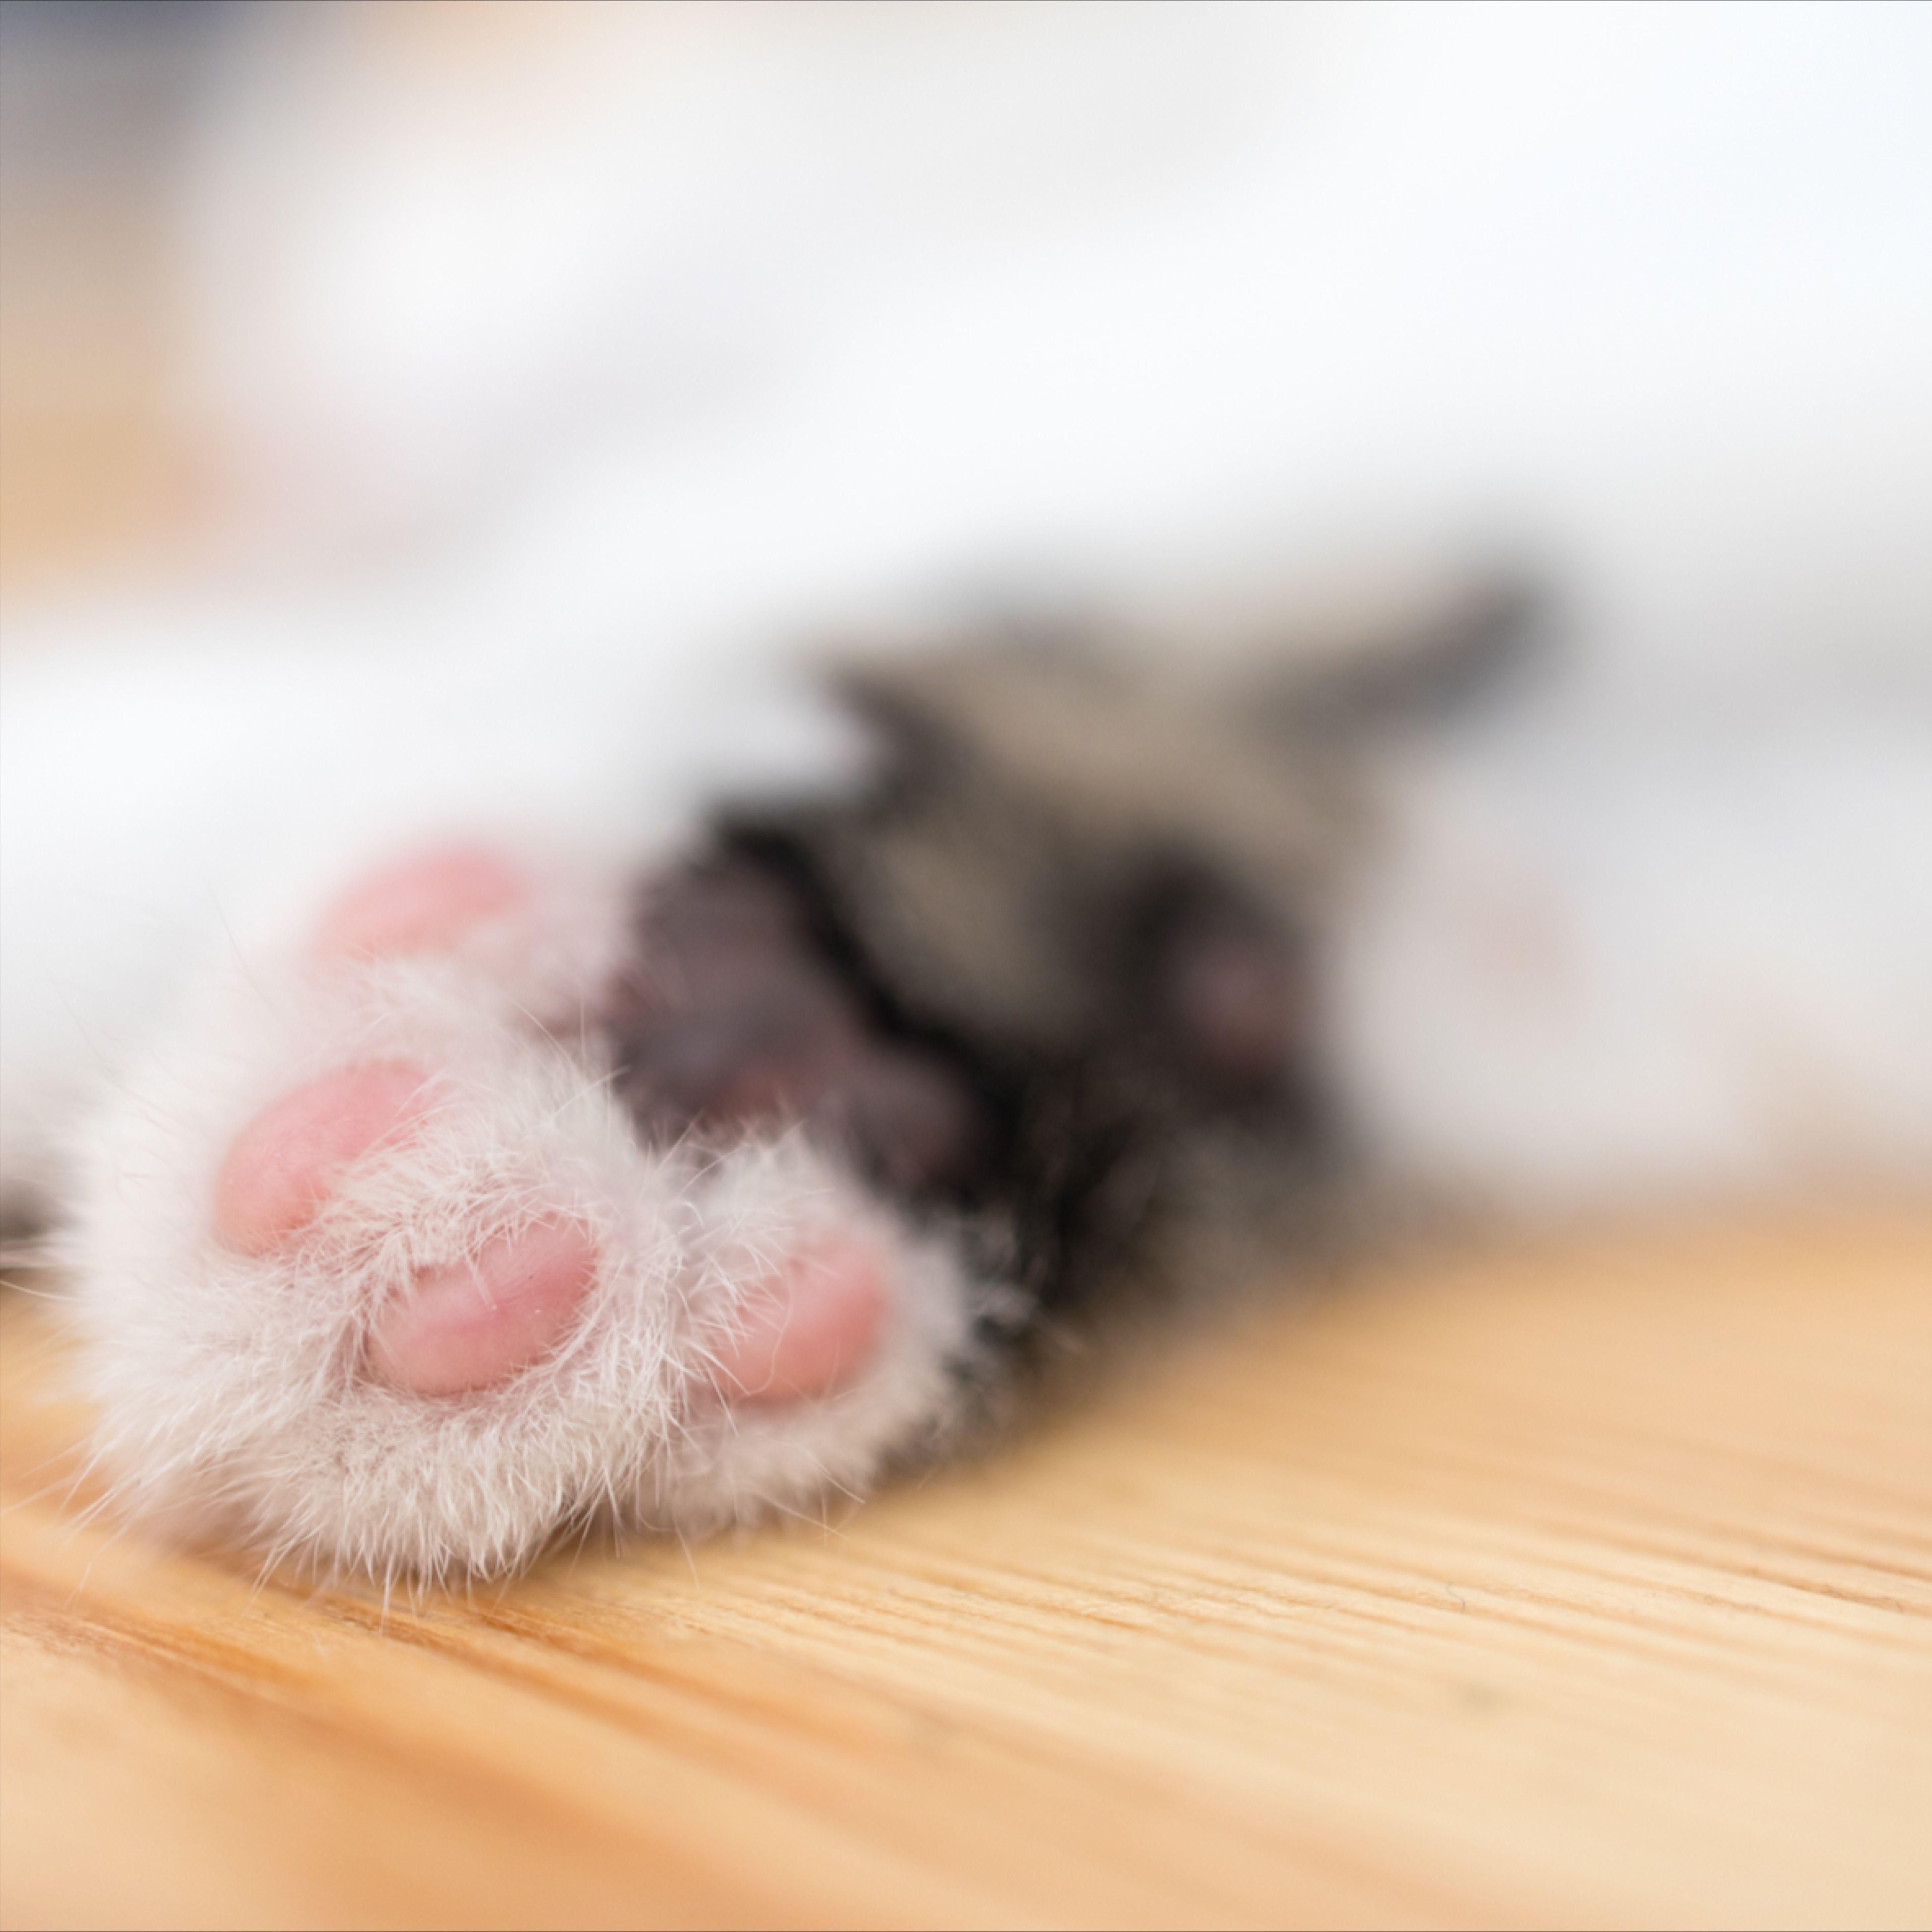 Cat Paw In 2020 Cat Paws Beautiful Cats Cute Cat Wallpaper